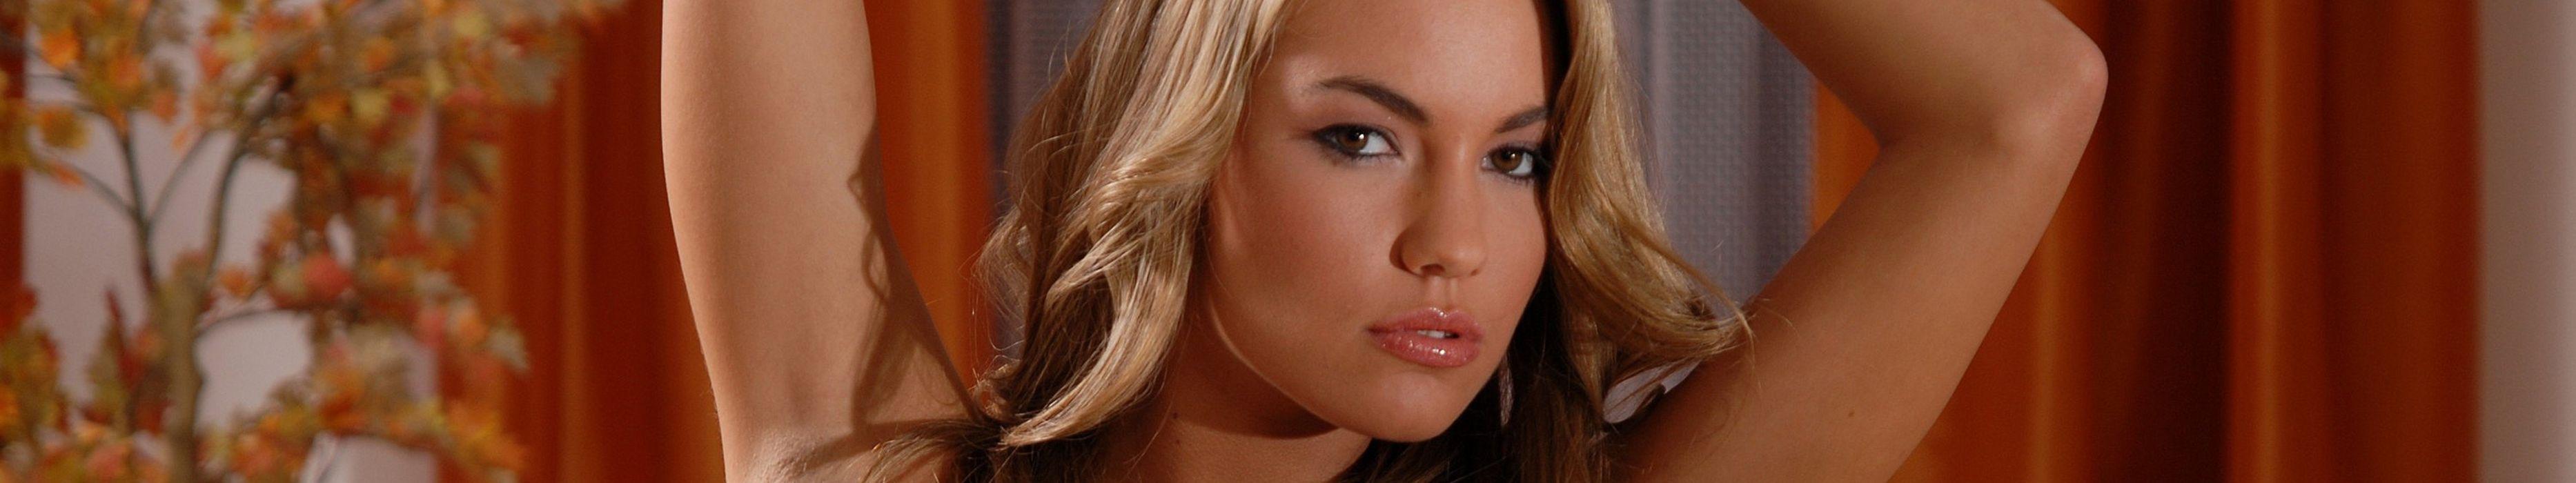 women Veronika Fasterova nude Eyefinity wallpaper